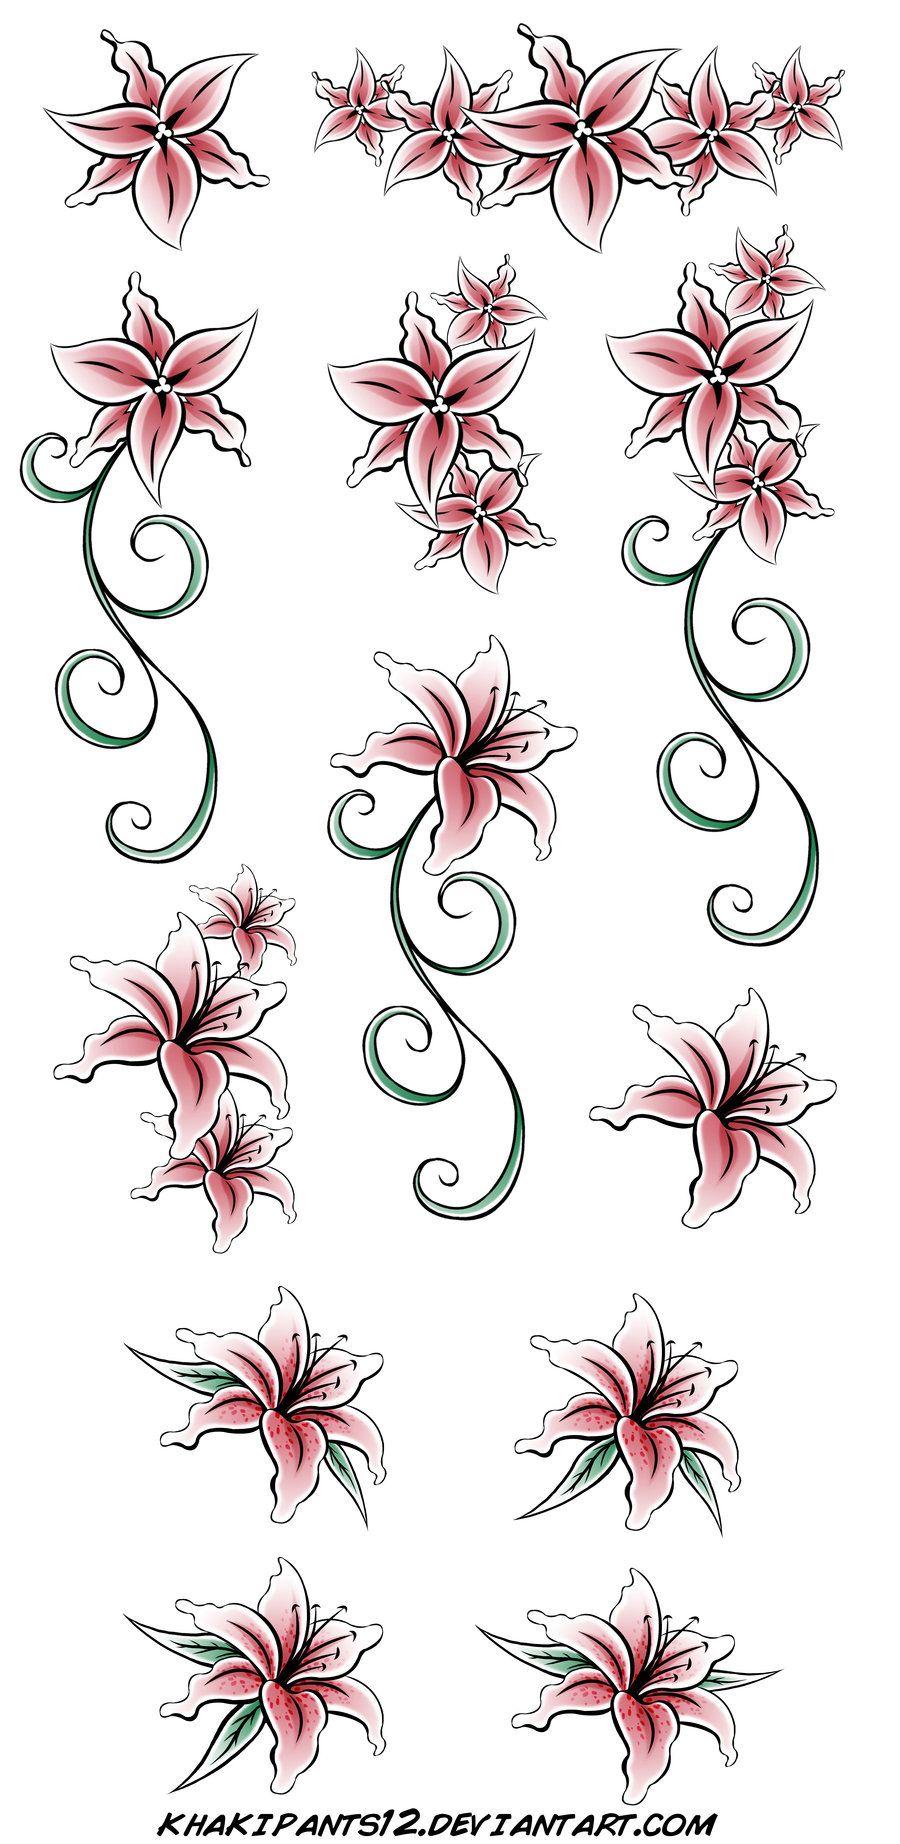 Stargazer Lily Flower Tattoo Designs: Lily Tattoo Design, Lily Flower